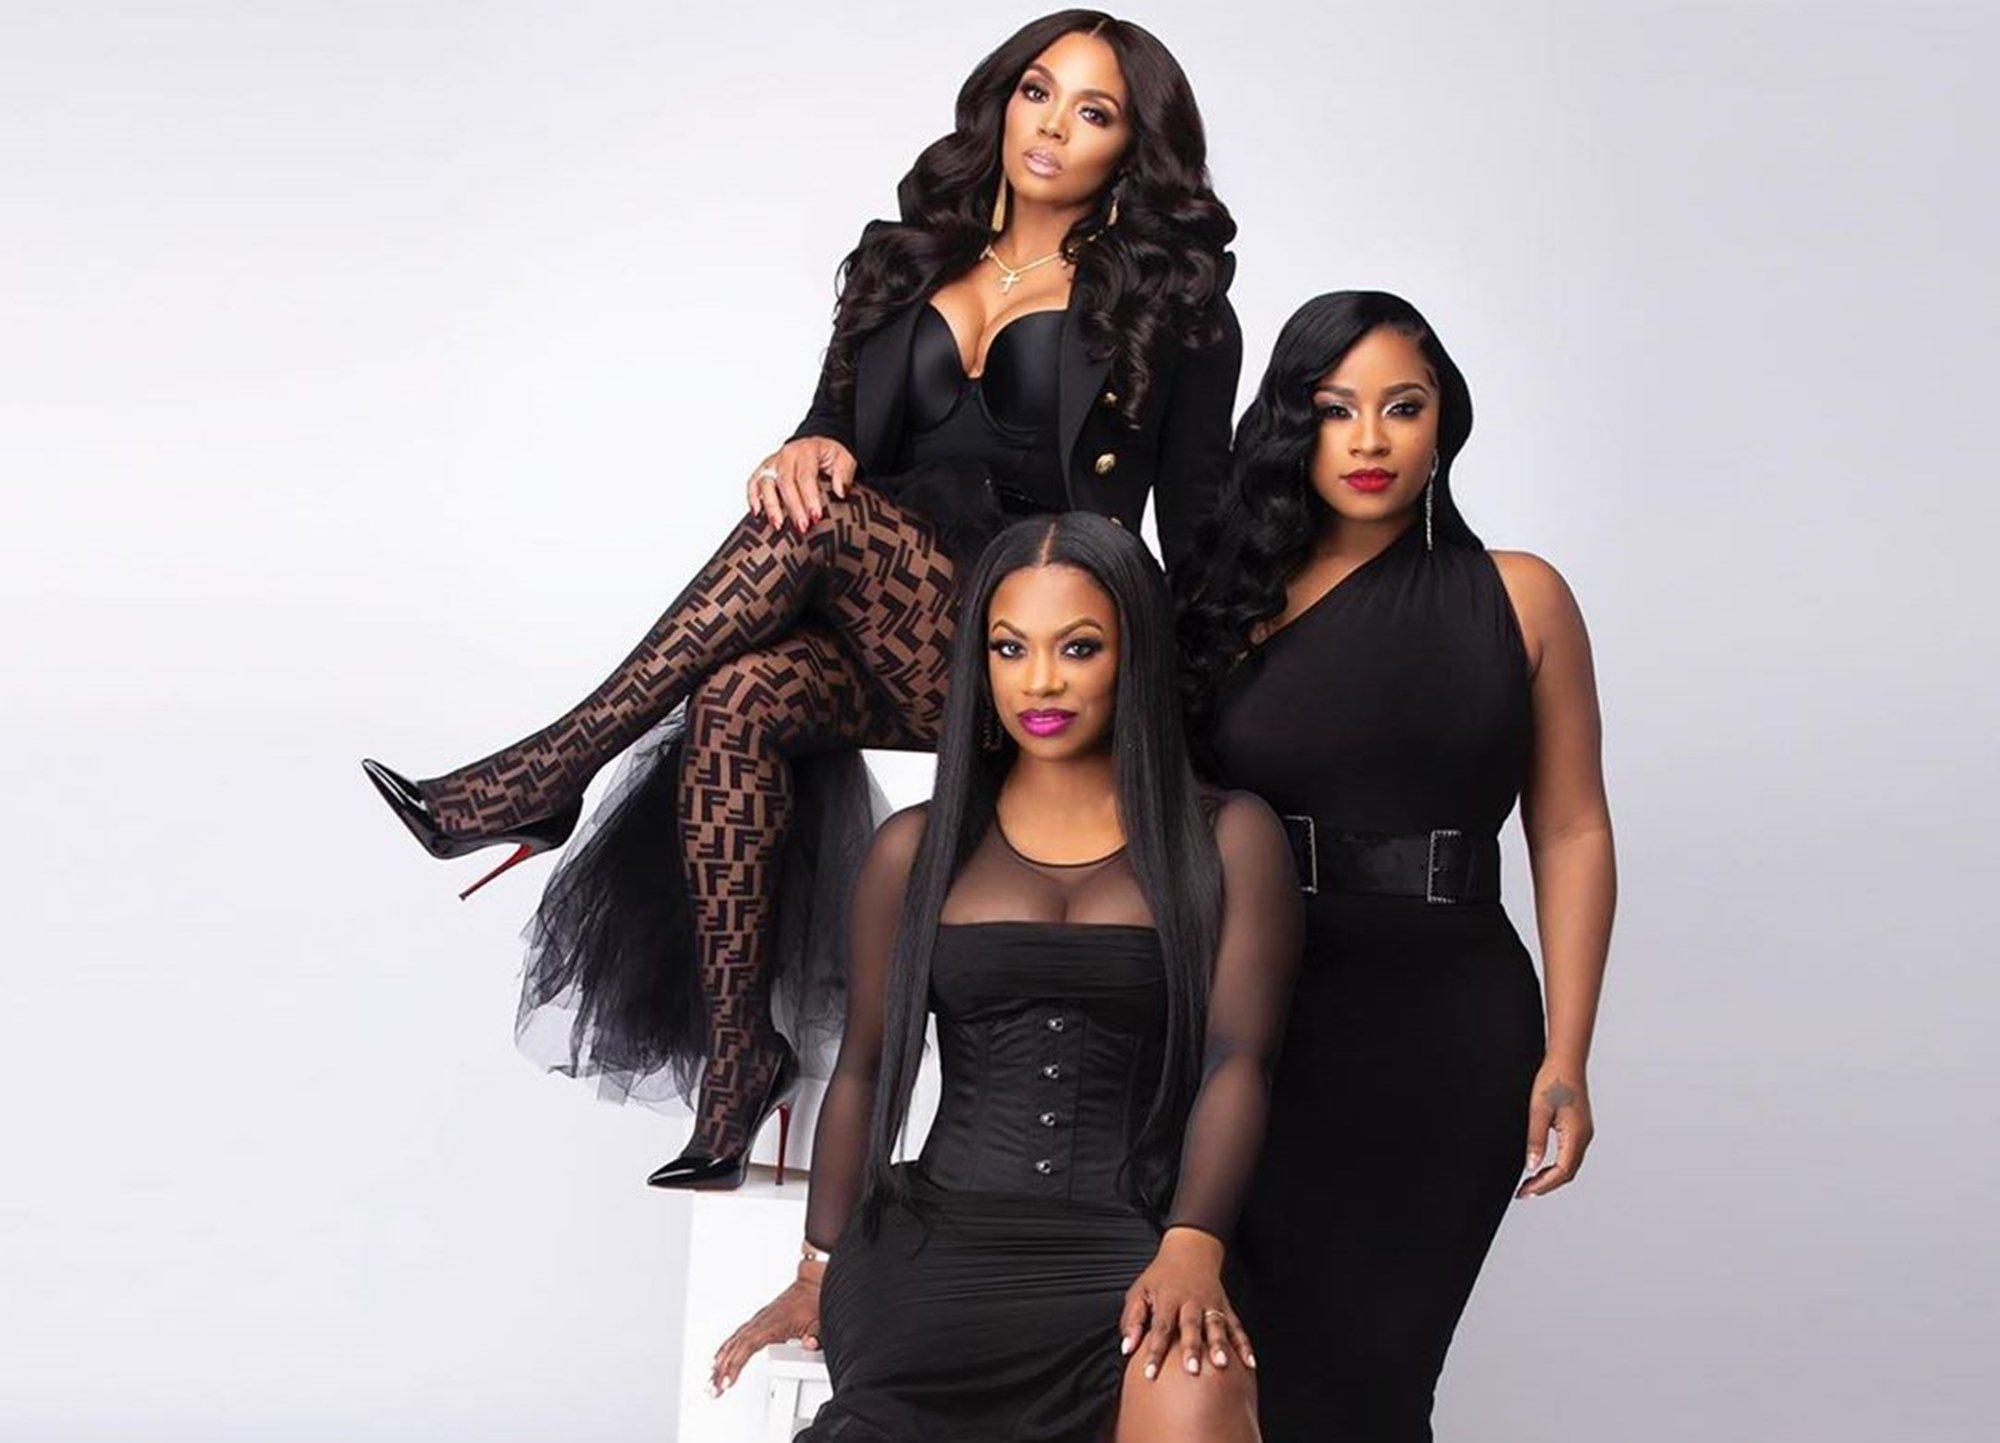 Kandi Burruss Teams Up With Toya Johnson And Rasheeda Frost To Redefine The Term Boss Ladies